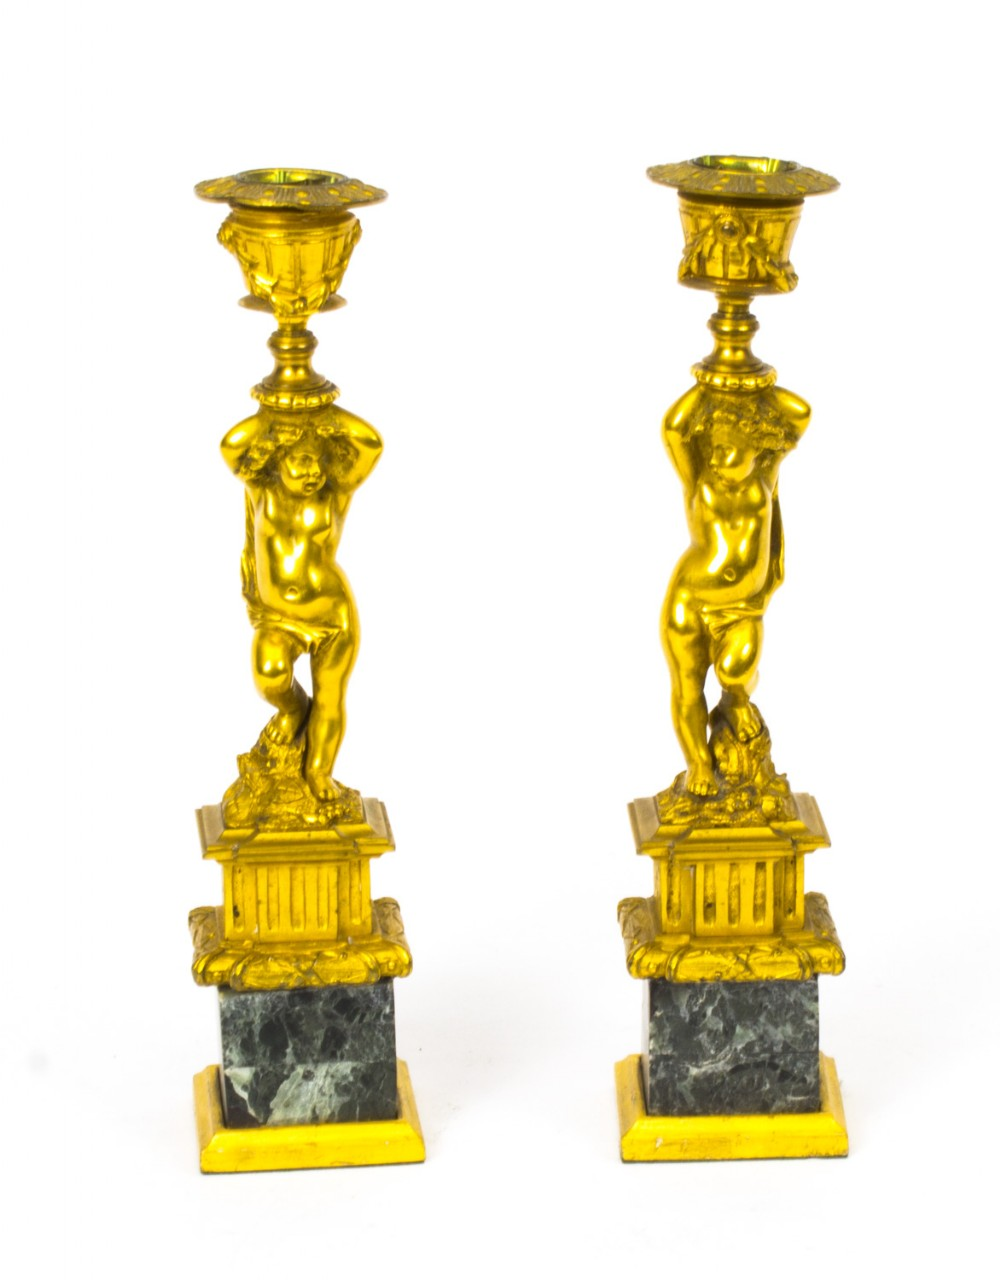 antique pair french ormolu cherub candlesticks c1870